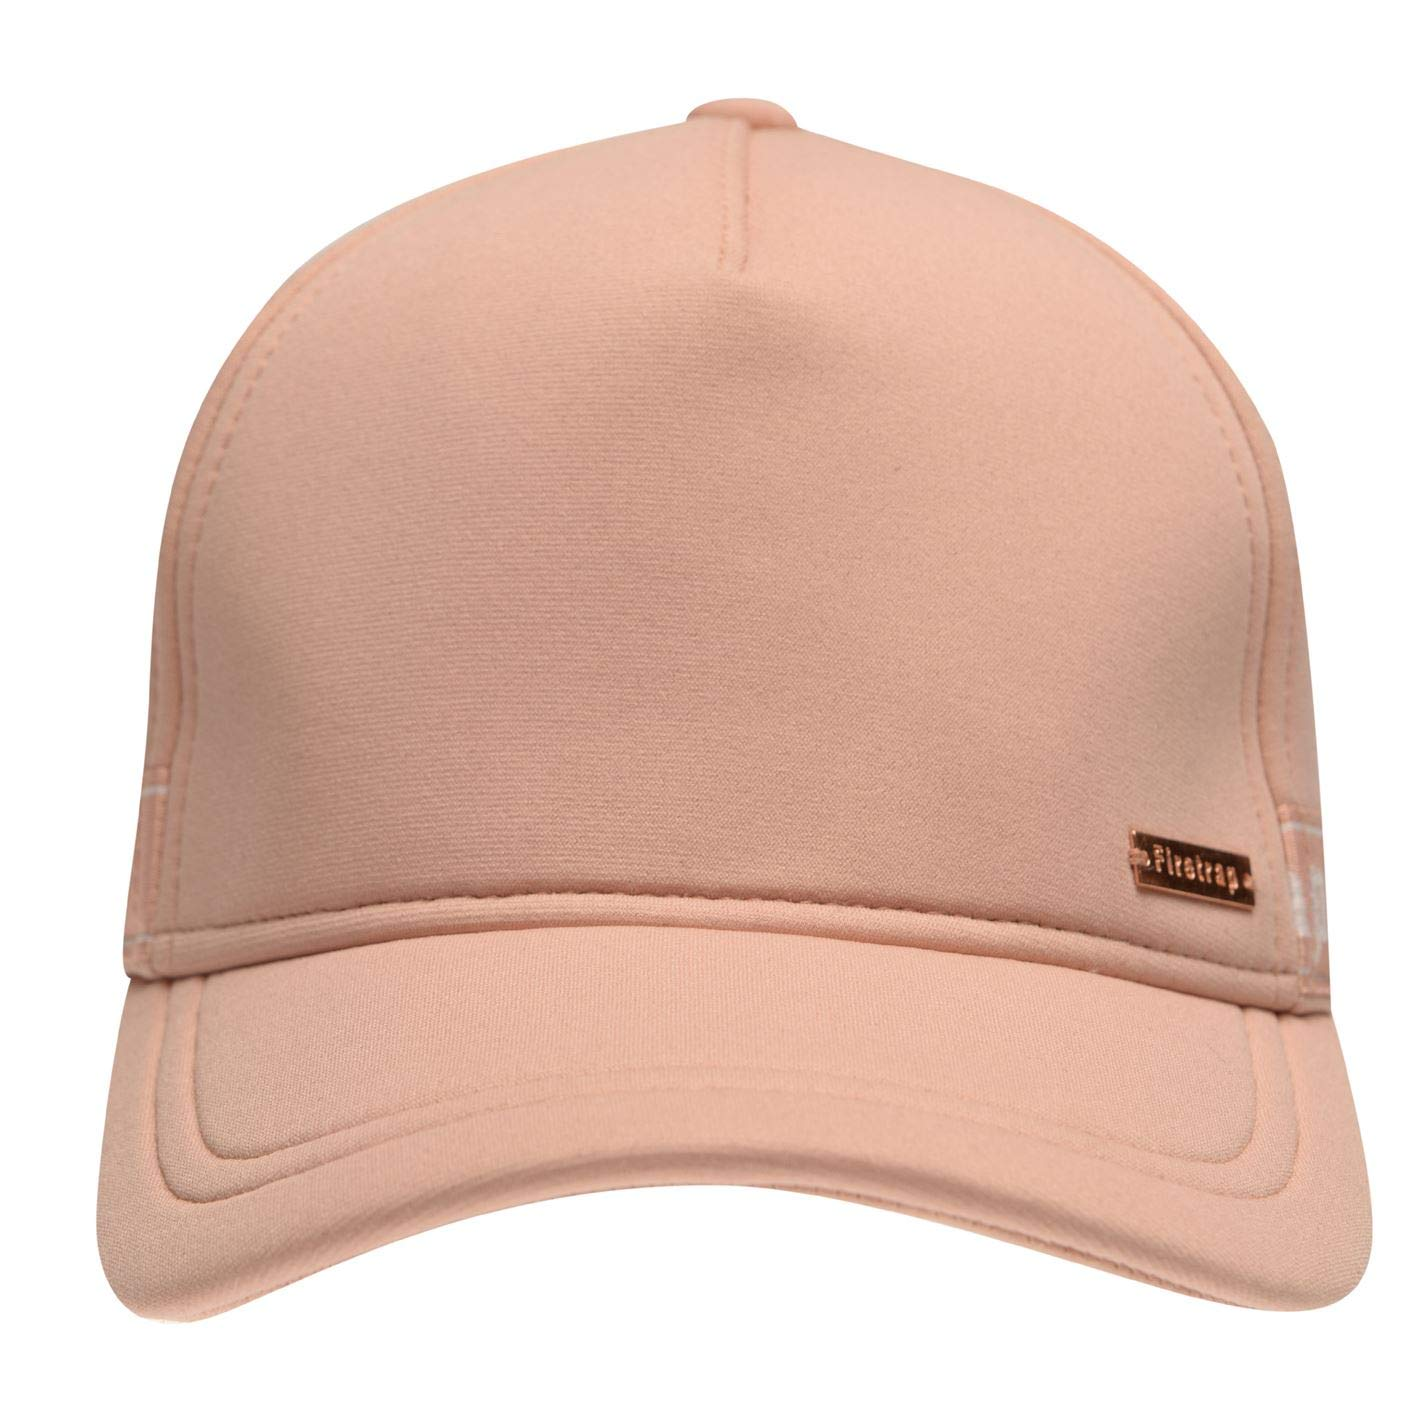 Firetrap Girls Range Sports Training Cap Baseball Hat